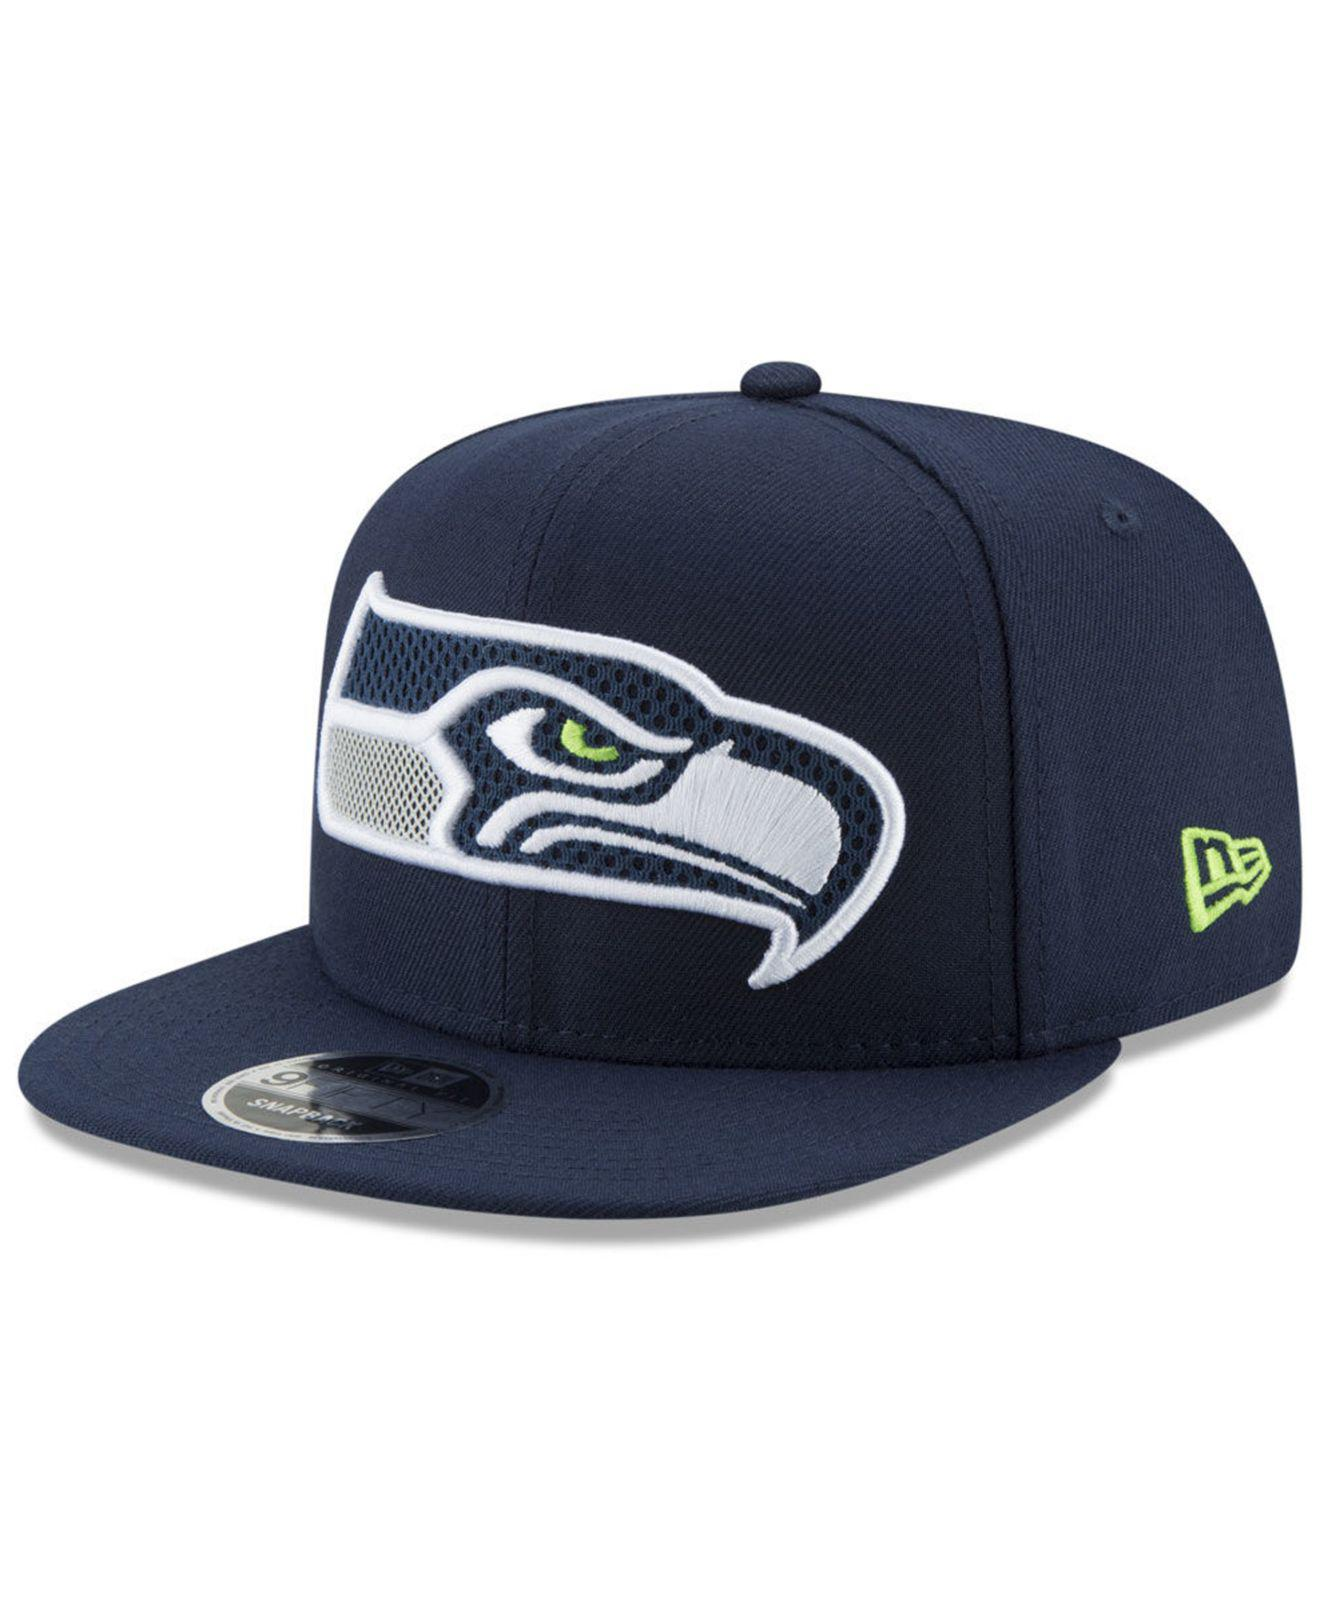 e17eae7a2dd Lyst - Ktz Seattle Seahawks Meshed Mix 9fifty Snapback Cap in Blue ...